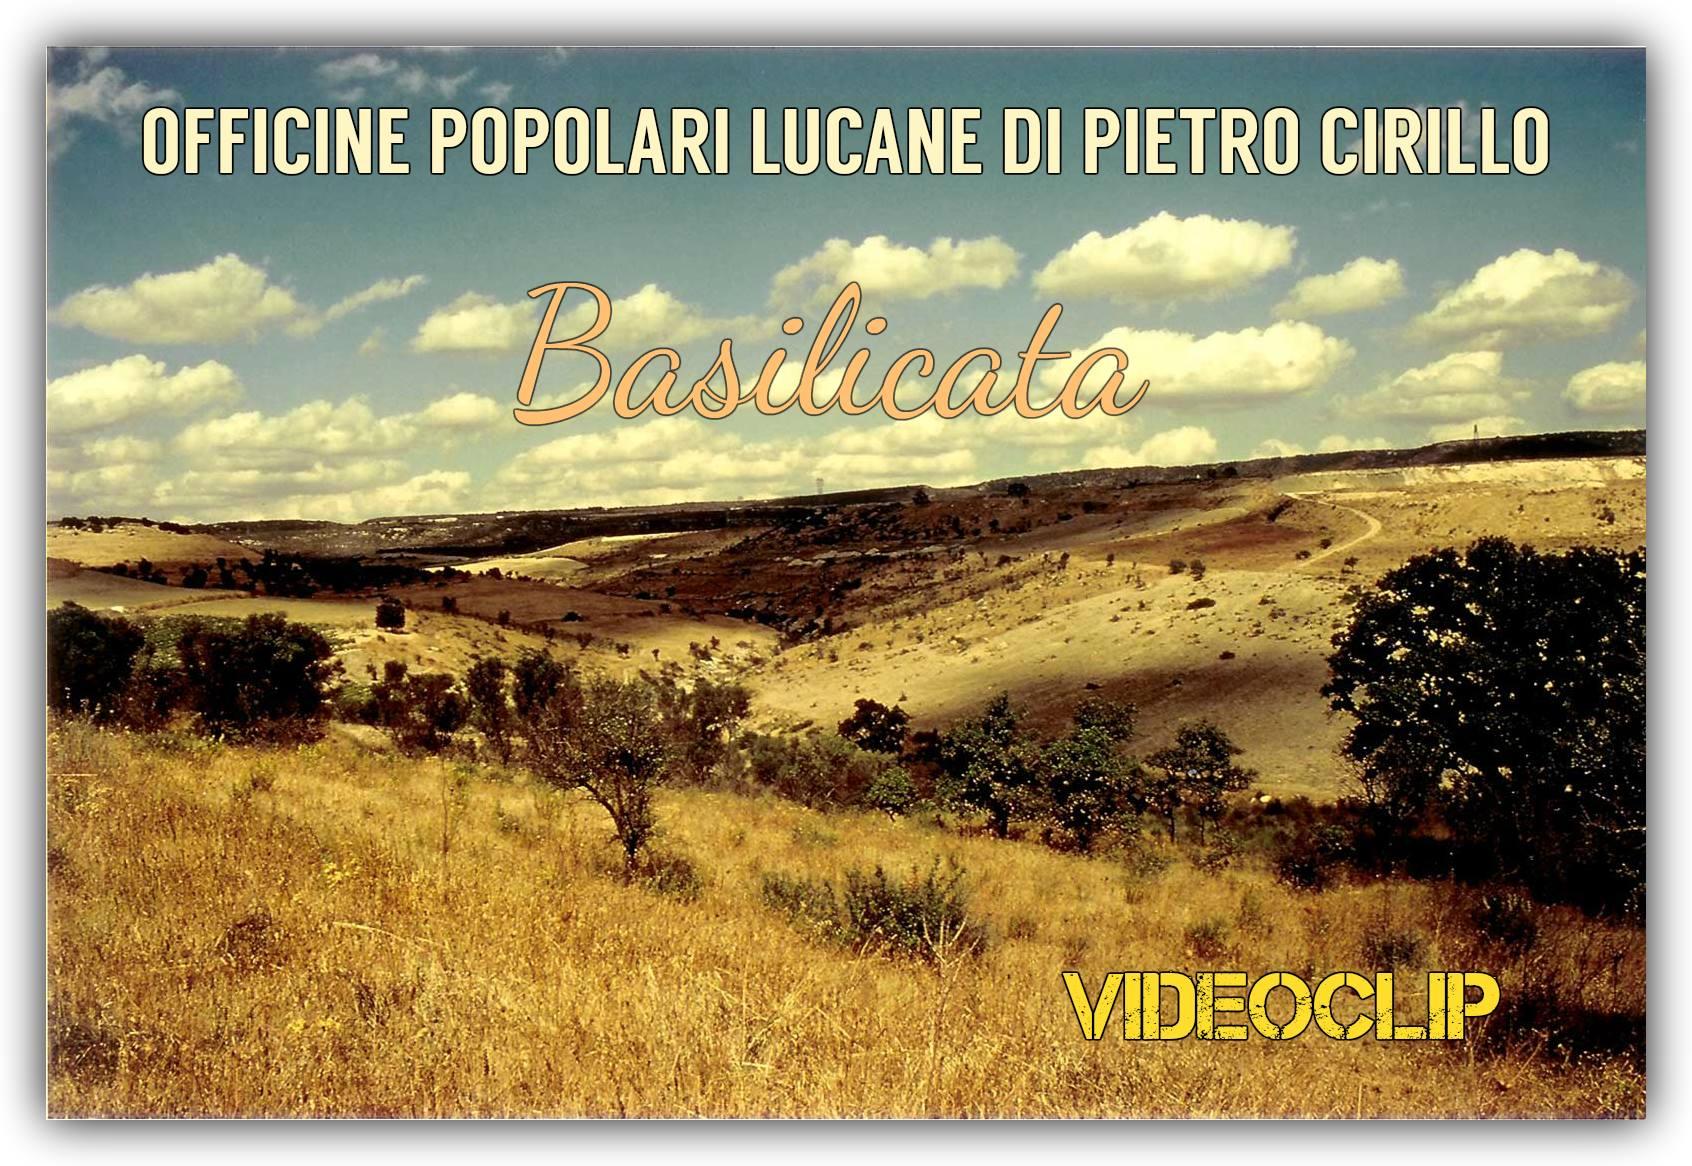 Officine Popolari Lucane - Basilicata